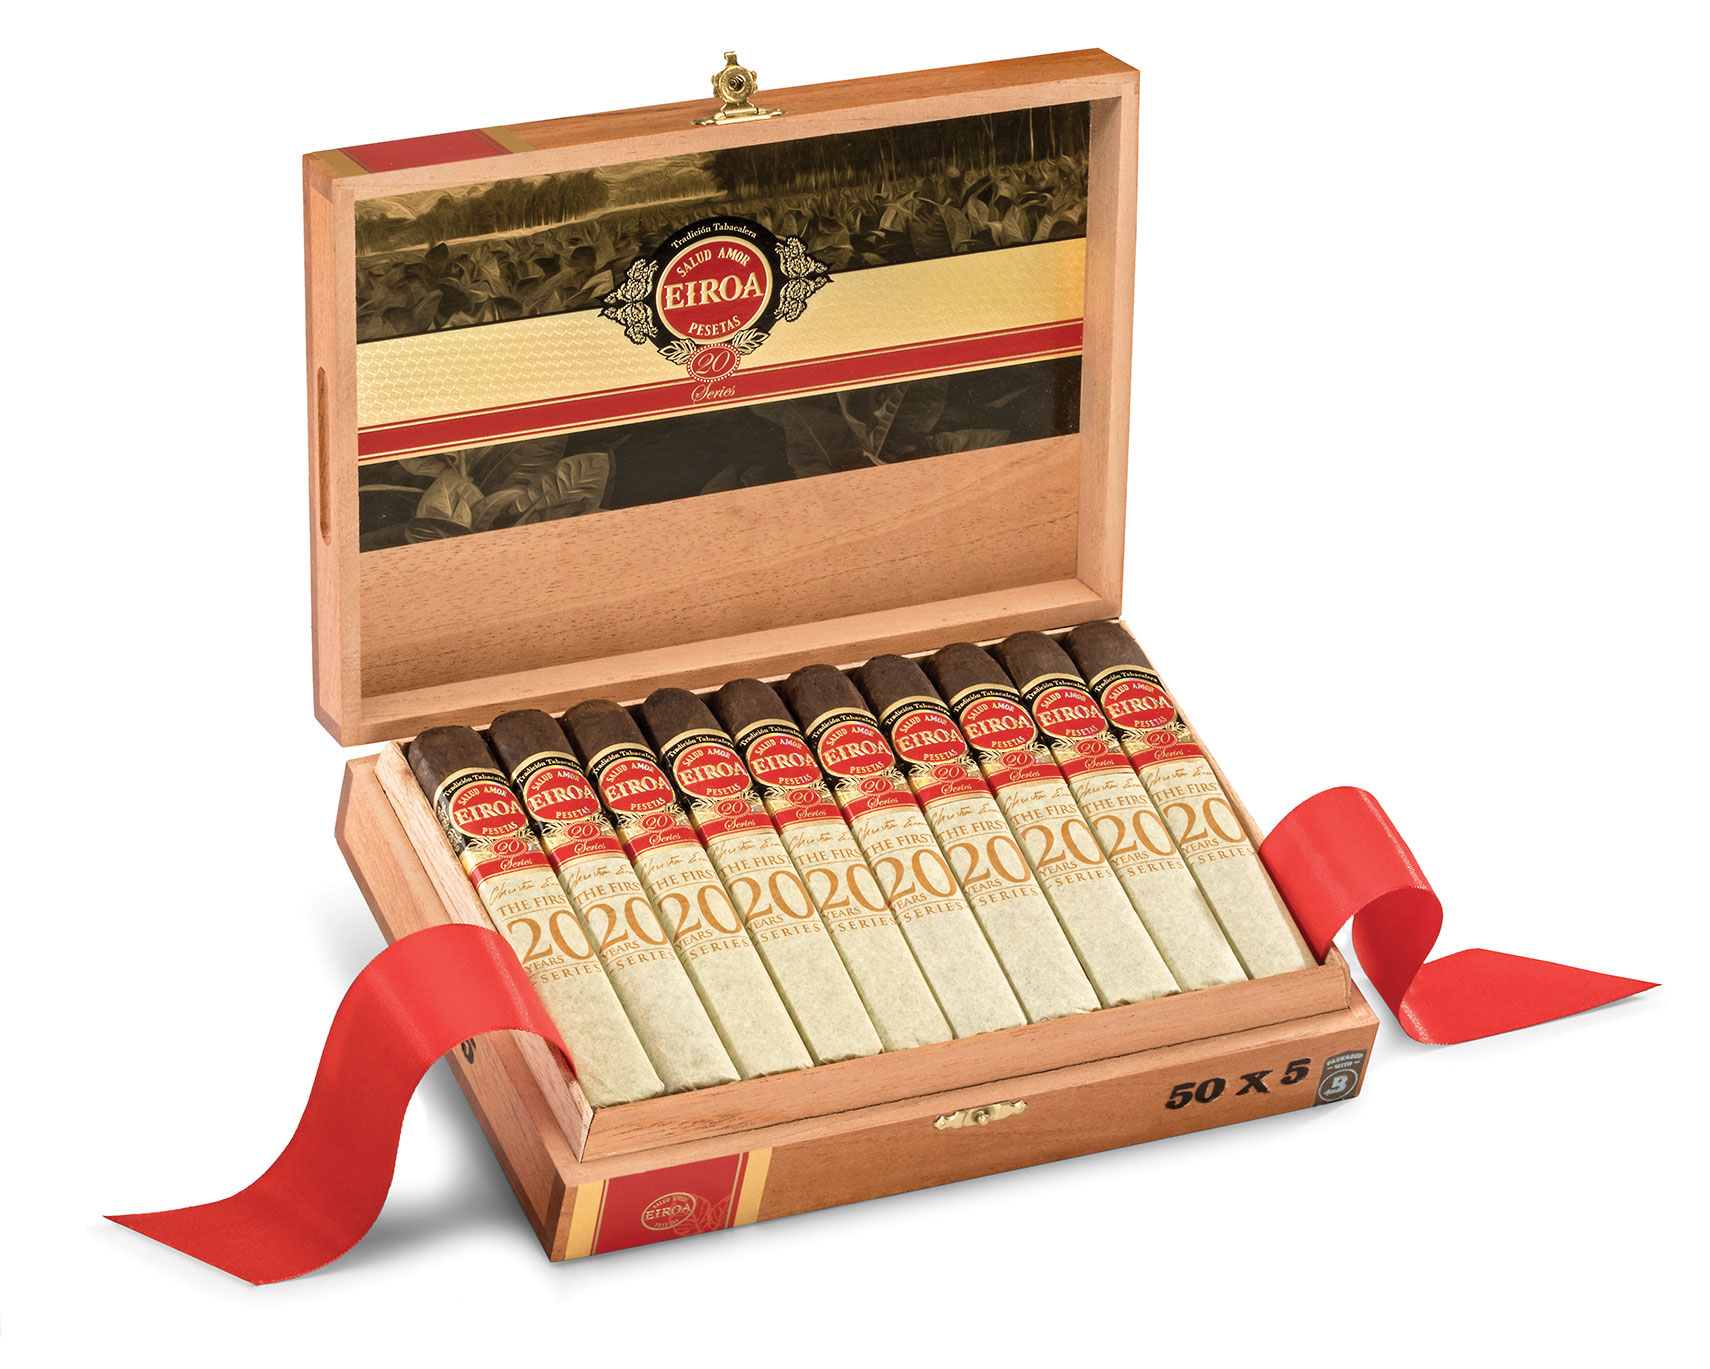 Eiora Cigars